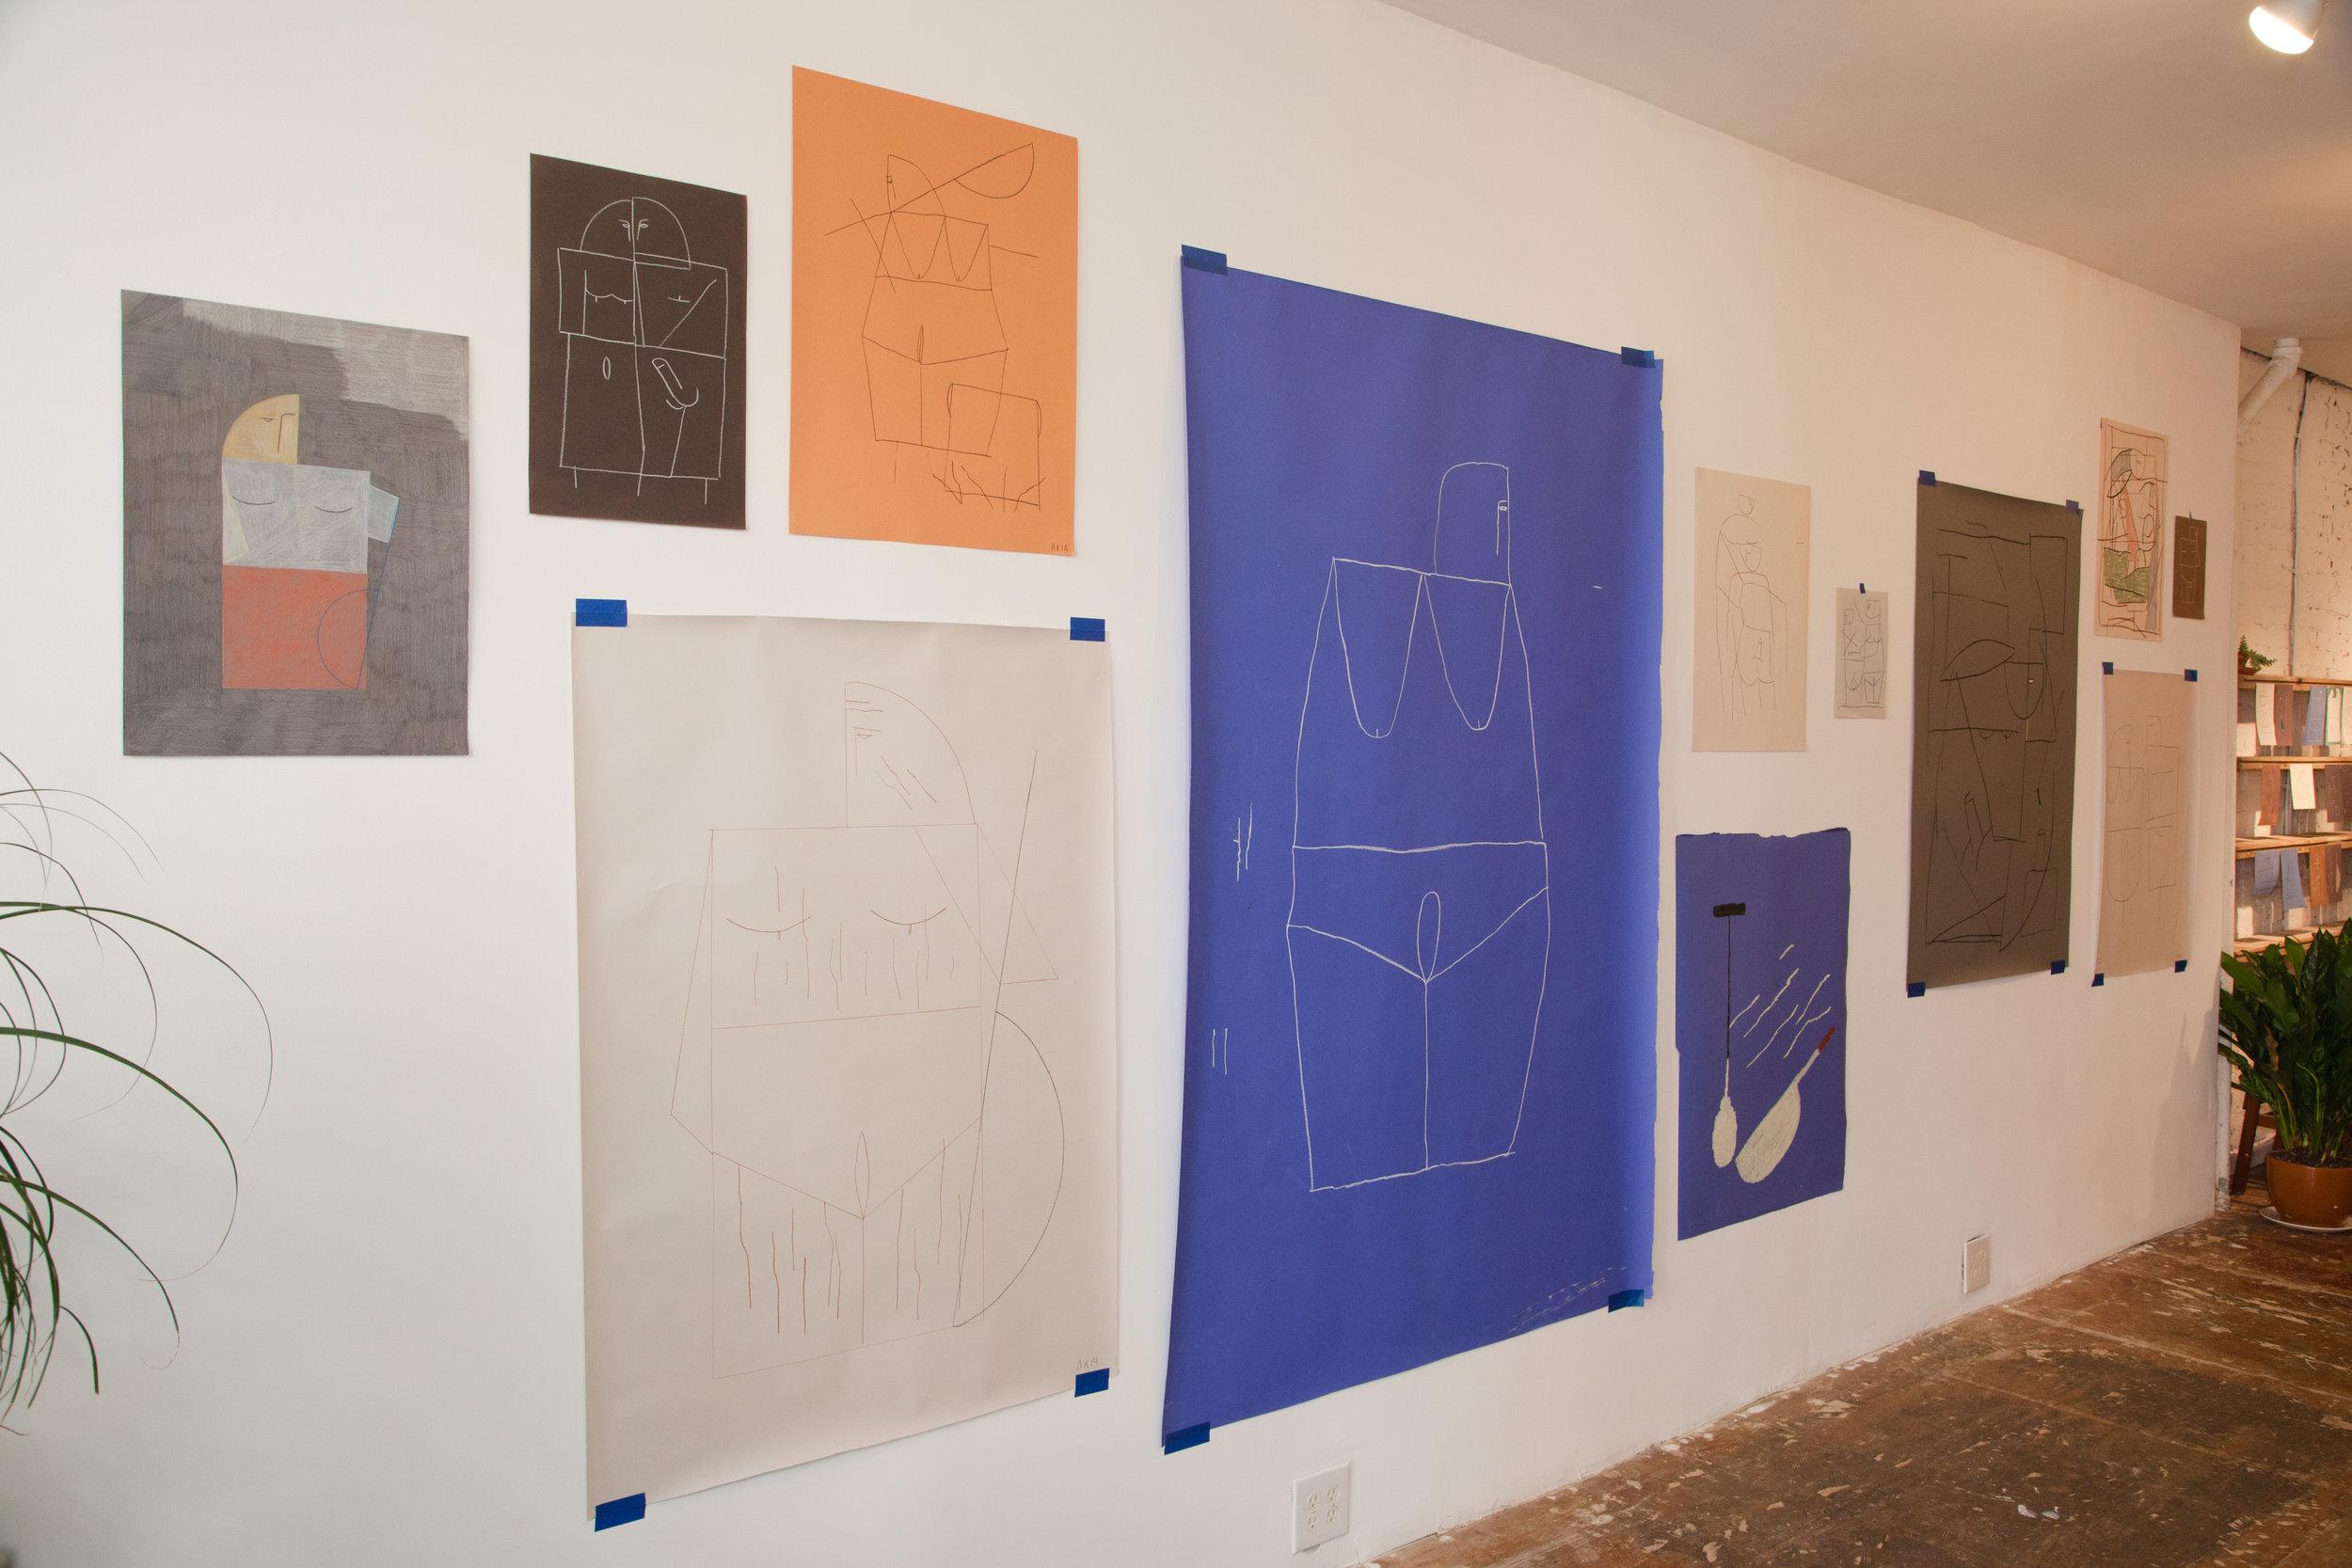 Ed. Varie, 9th Street East Village location, Ana Kras exhibition, Photo courtesy of Ed. Varie